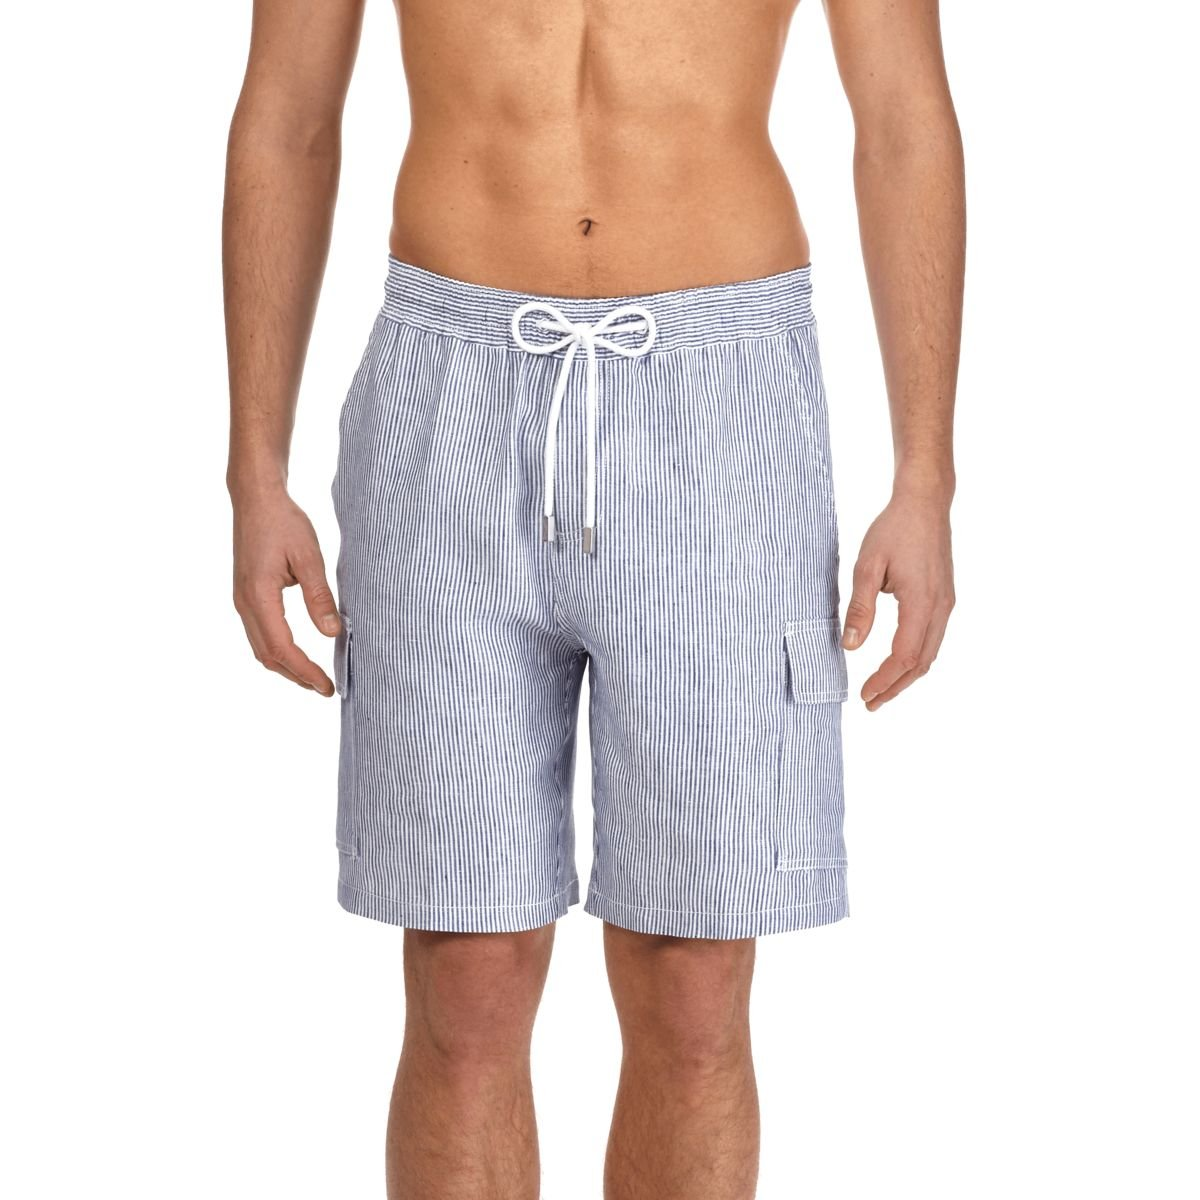 Vilebrequin - Men Cargo Linen Bermuda Shorts Micro Stripes - Ultramarine - S